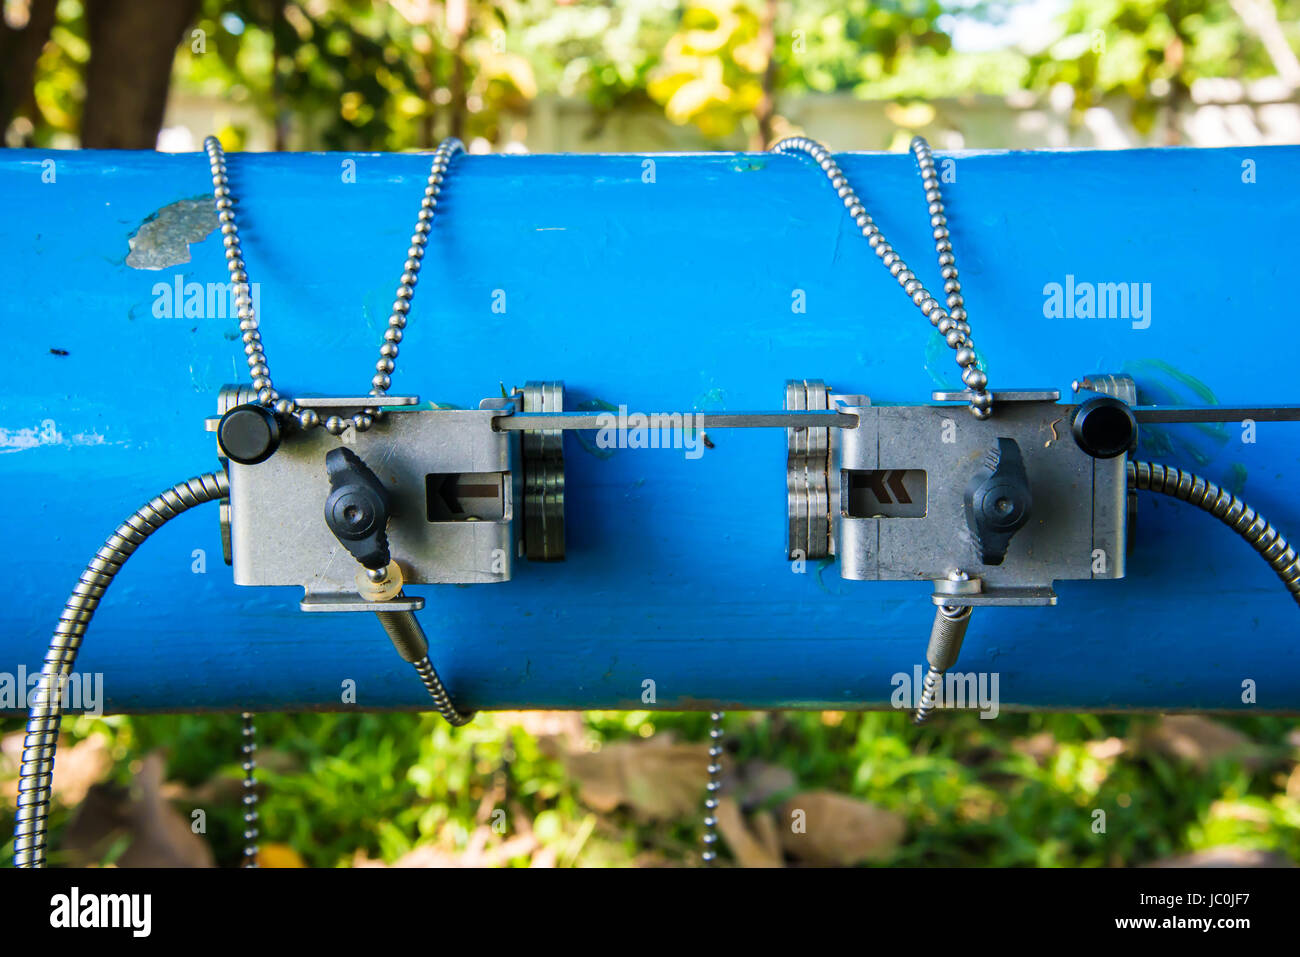 Ultrasonic flow meter for measure rate of water flow. - Stock Image